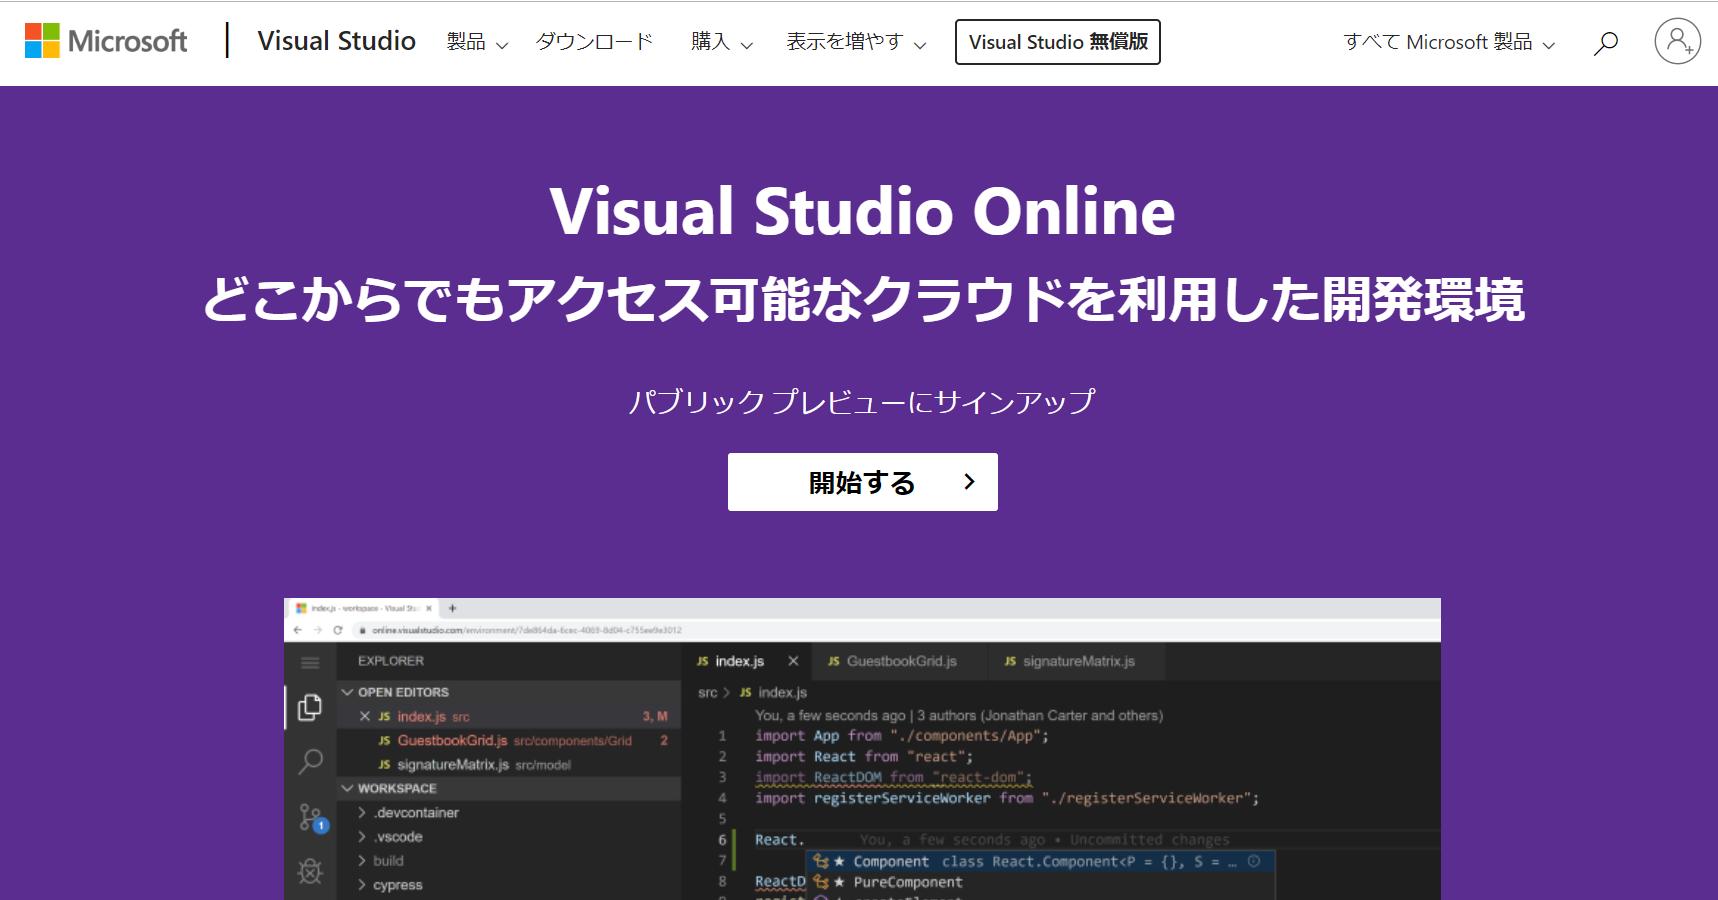 Visual Studio Online - Web ベースの IDE と共同コード エディター - Google Chrome 2019-11-05 10.22.02.png